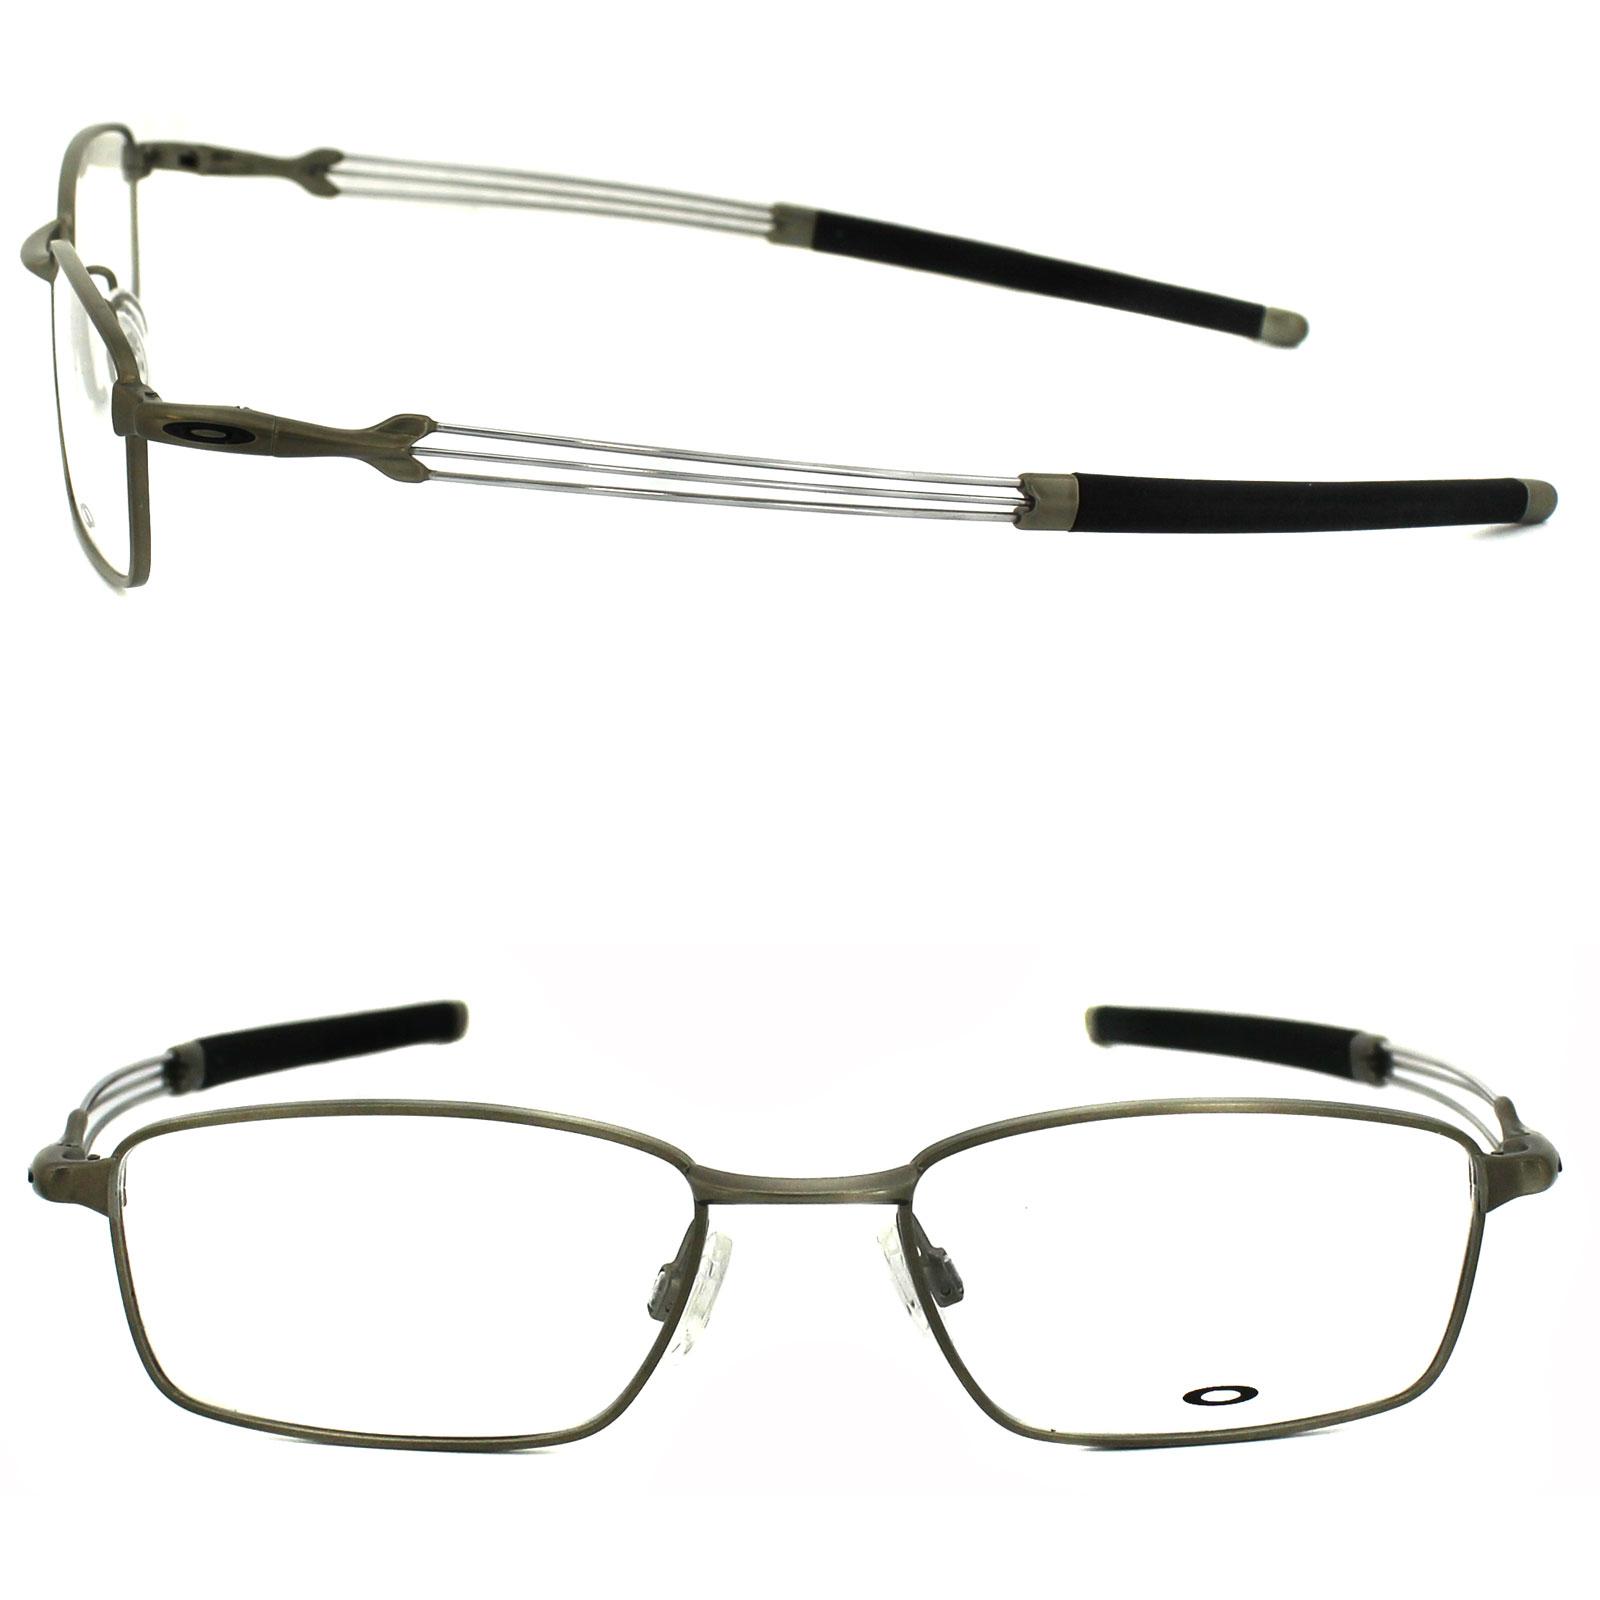 Oakley Clear Frame Glasses : Oakley Glasses Frames Catapult 5092-03 Light Silver Clear ...